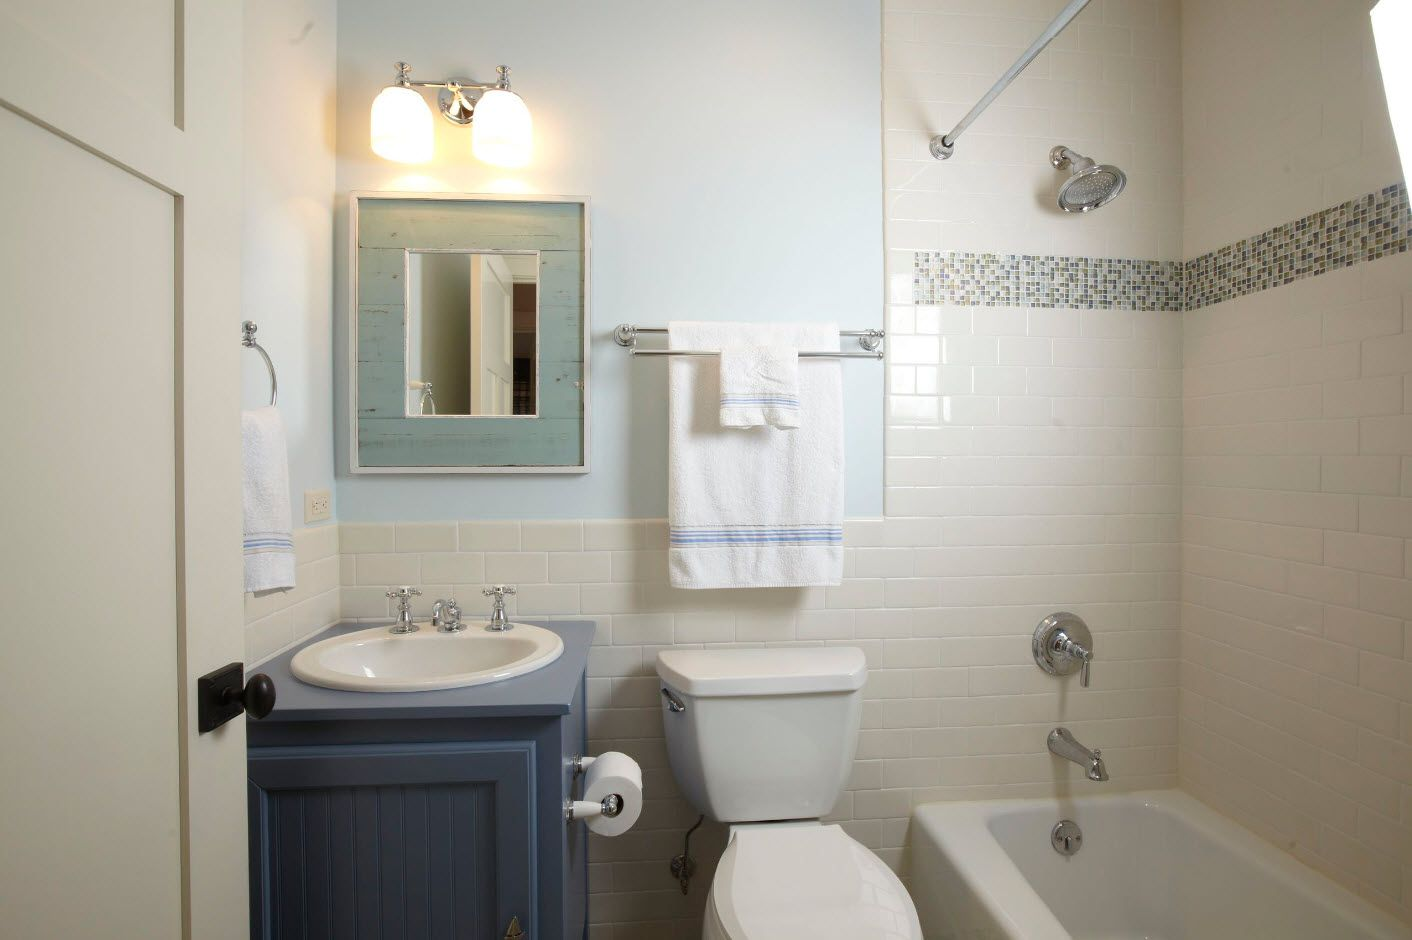 Small bathroom in the photo | Tiny Bathroom | Pinterest | Small ...